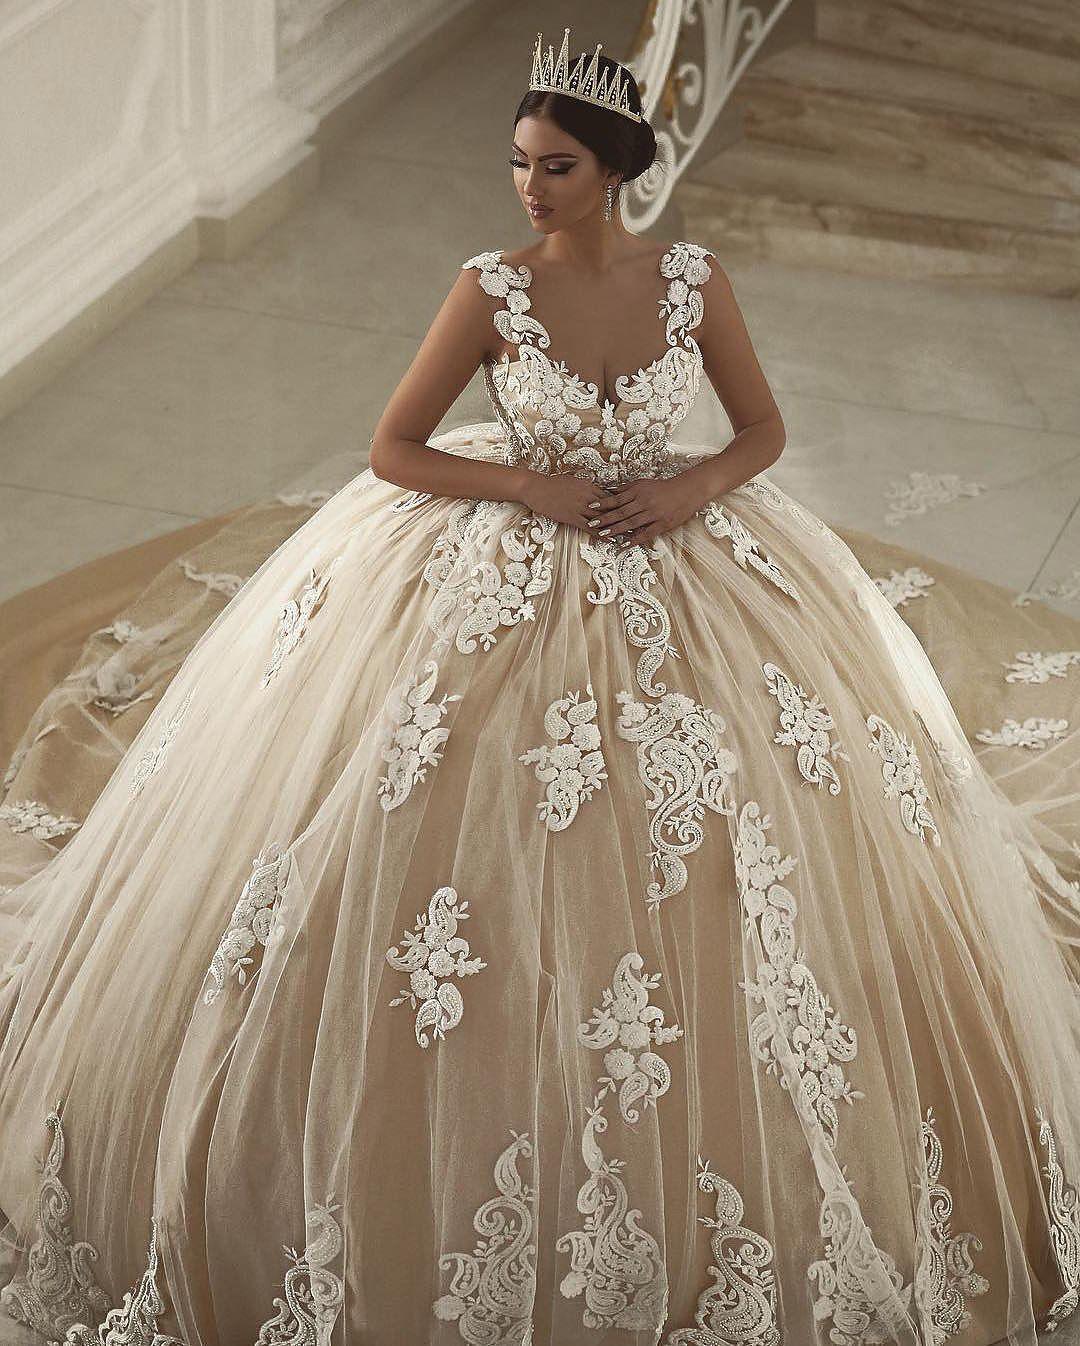 99 Tumblr Ball Gowns Wedding Wedding Dress Necklines Bridal Ball Gown